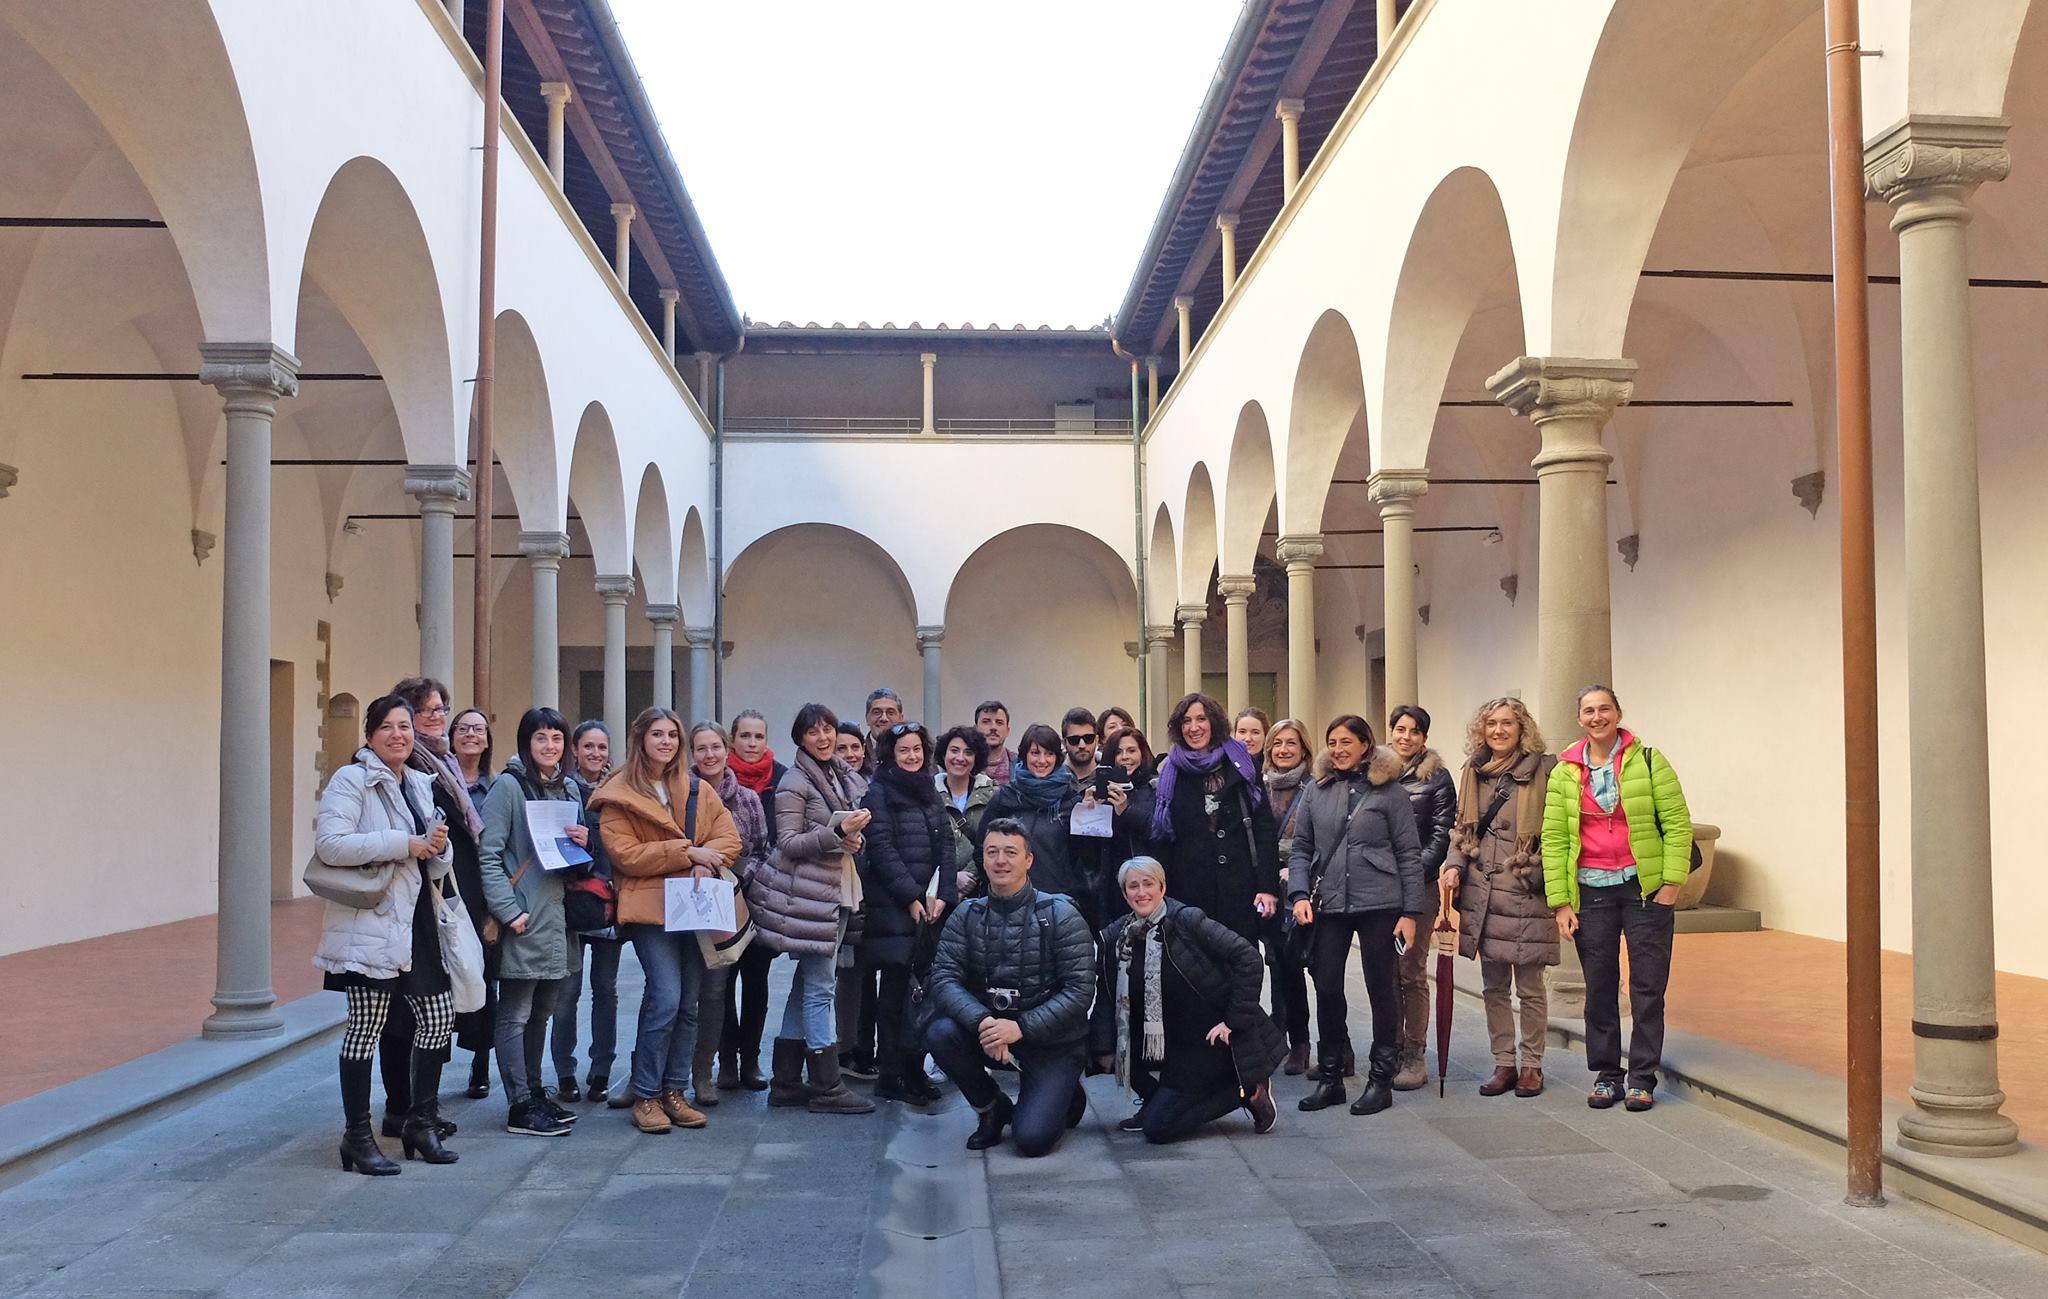 Corso social media per i musei